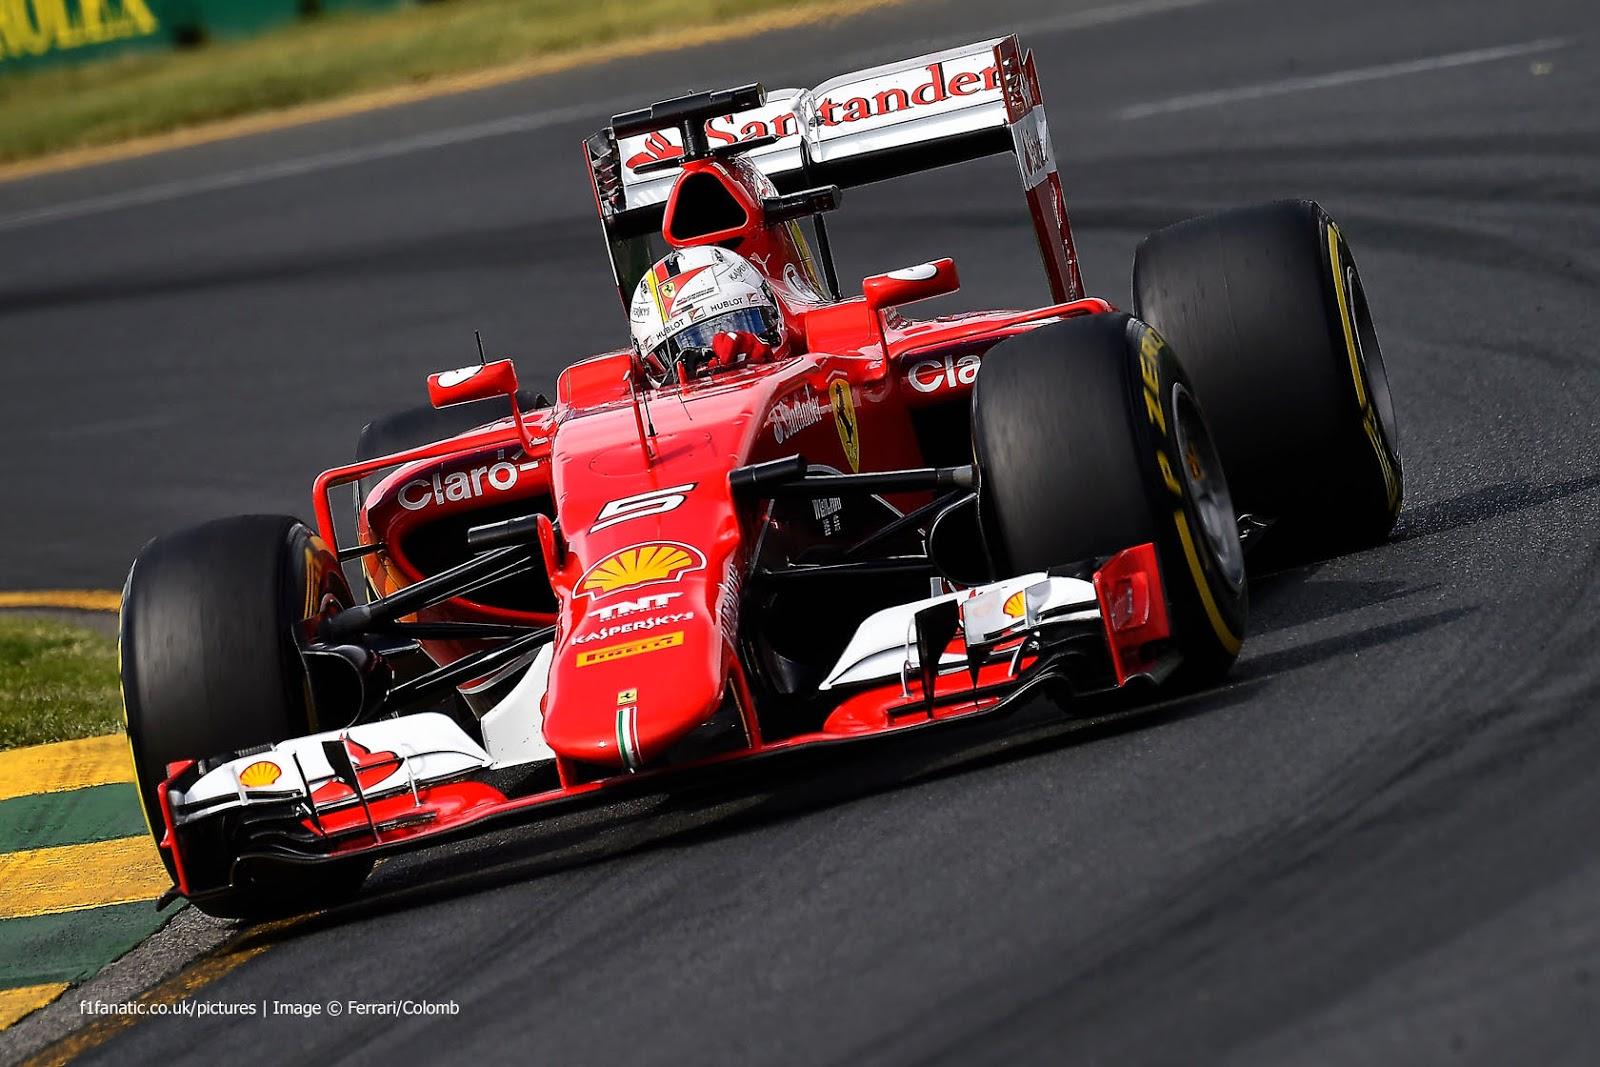 F1 wallpaper kimi raikkonen 8